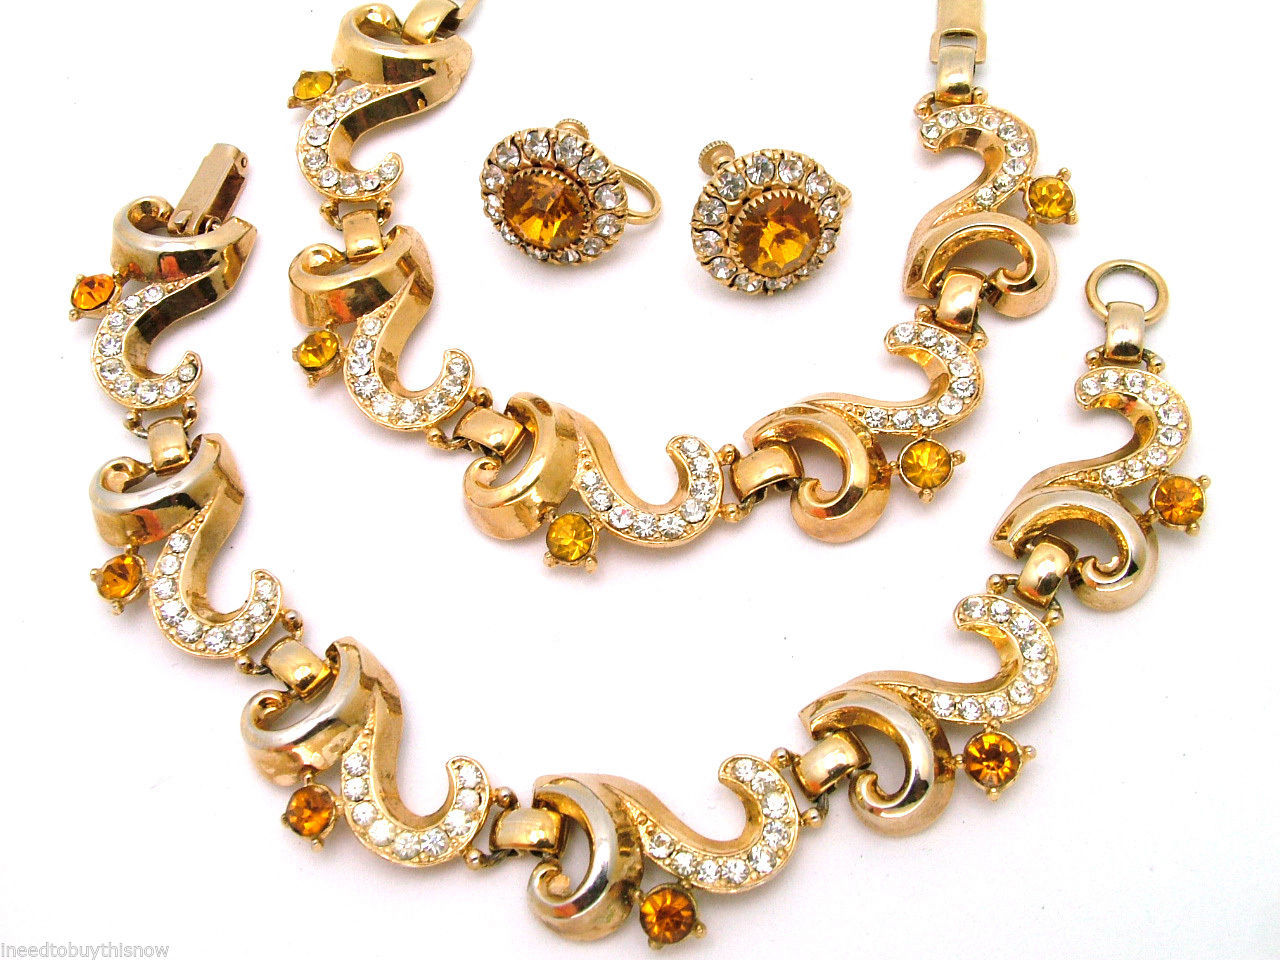 Vintage LISNER Necklace Bracelet Set With Screw Back Earrings In Citrine & Clear